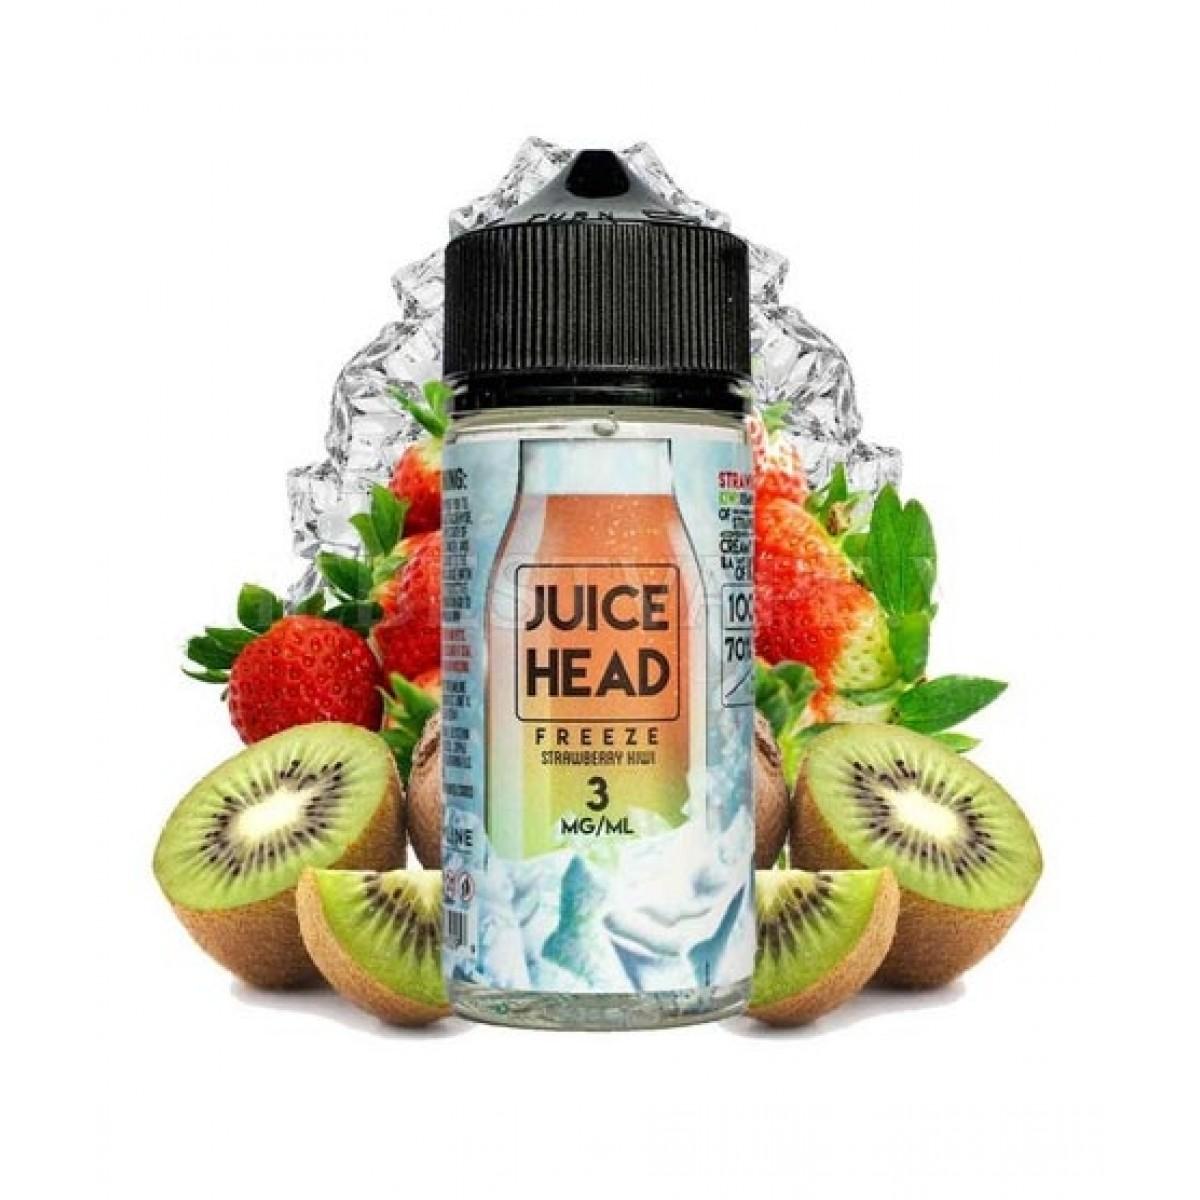 Juice Head Strawberry Kiwi Vape Flavor Price In Pakistan Buy Juice Head Extra Freeze 100ml Ishopping Pk